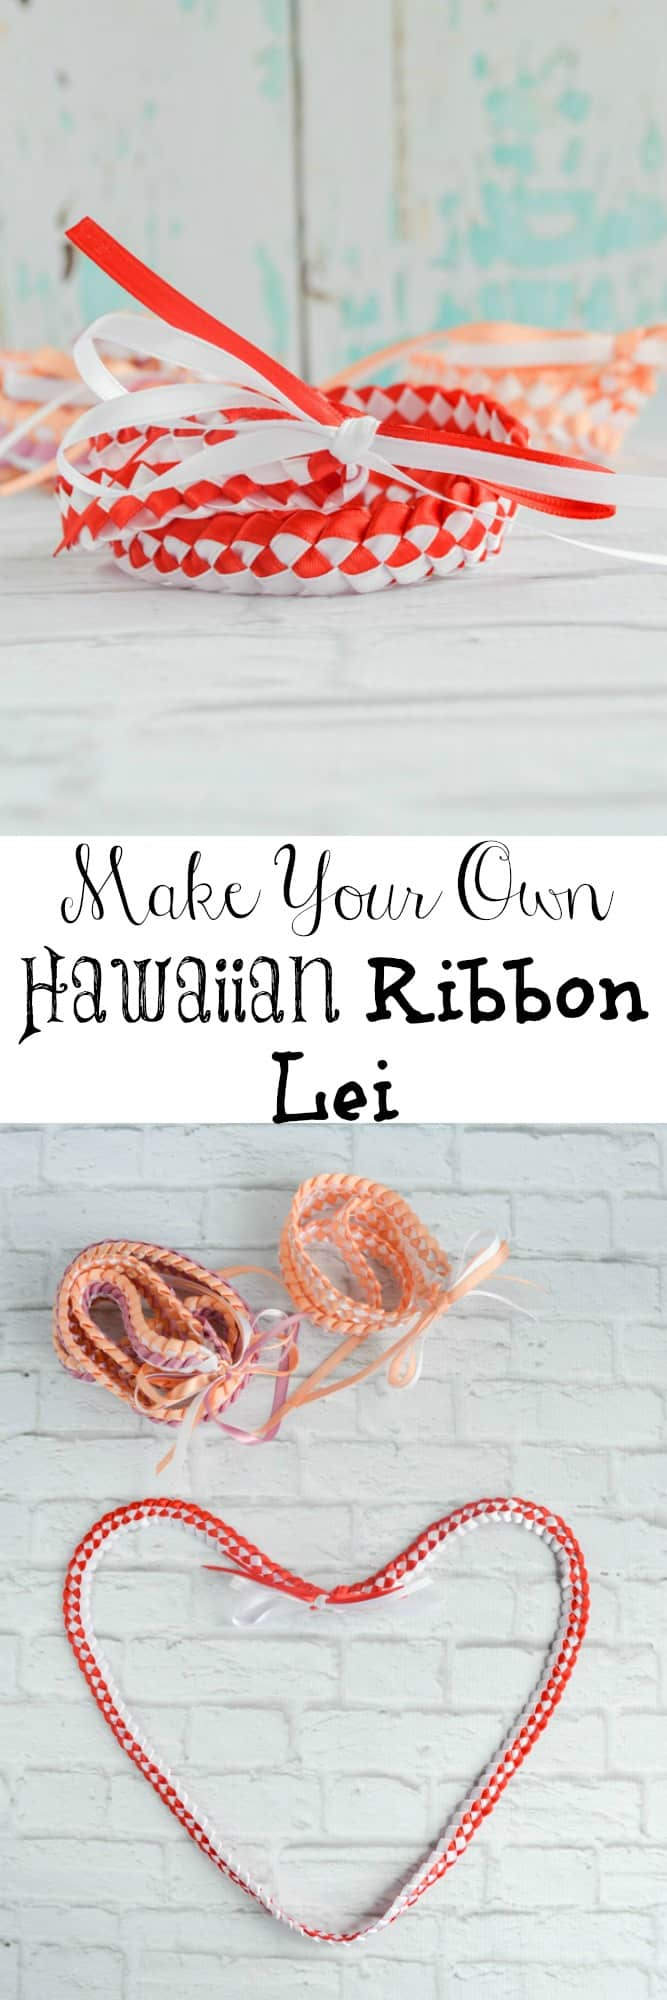 Make your own Hawaiian Ribbon lei